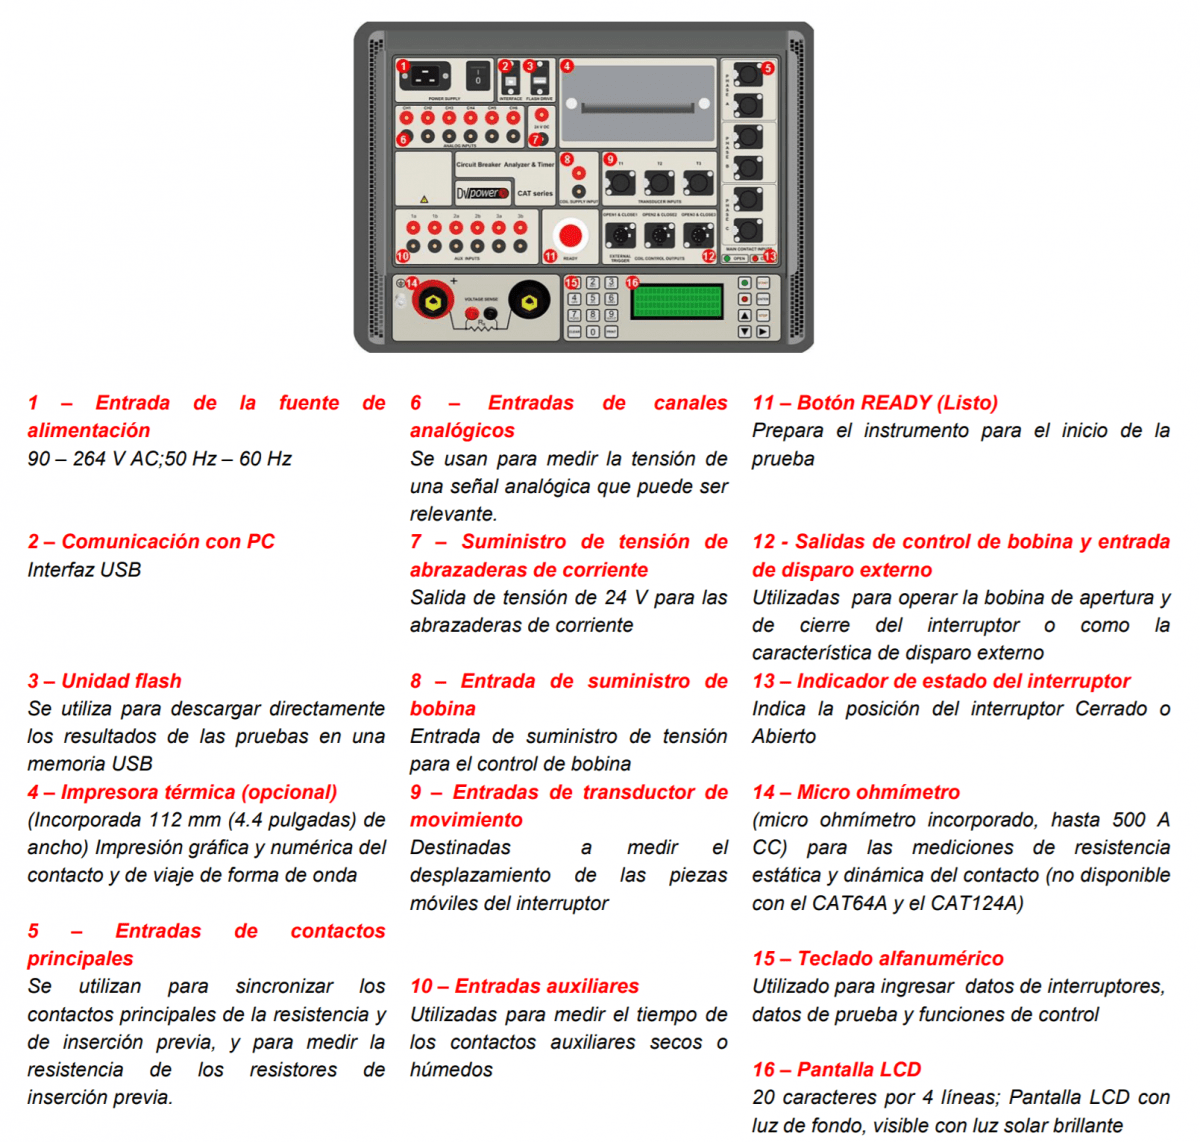 Panel del analizador de interruptores